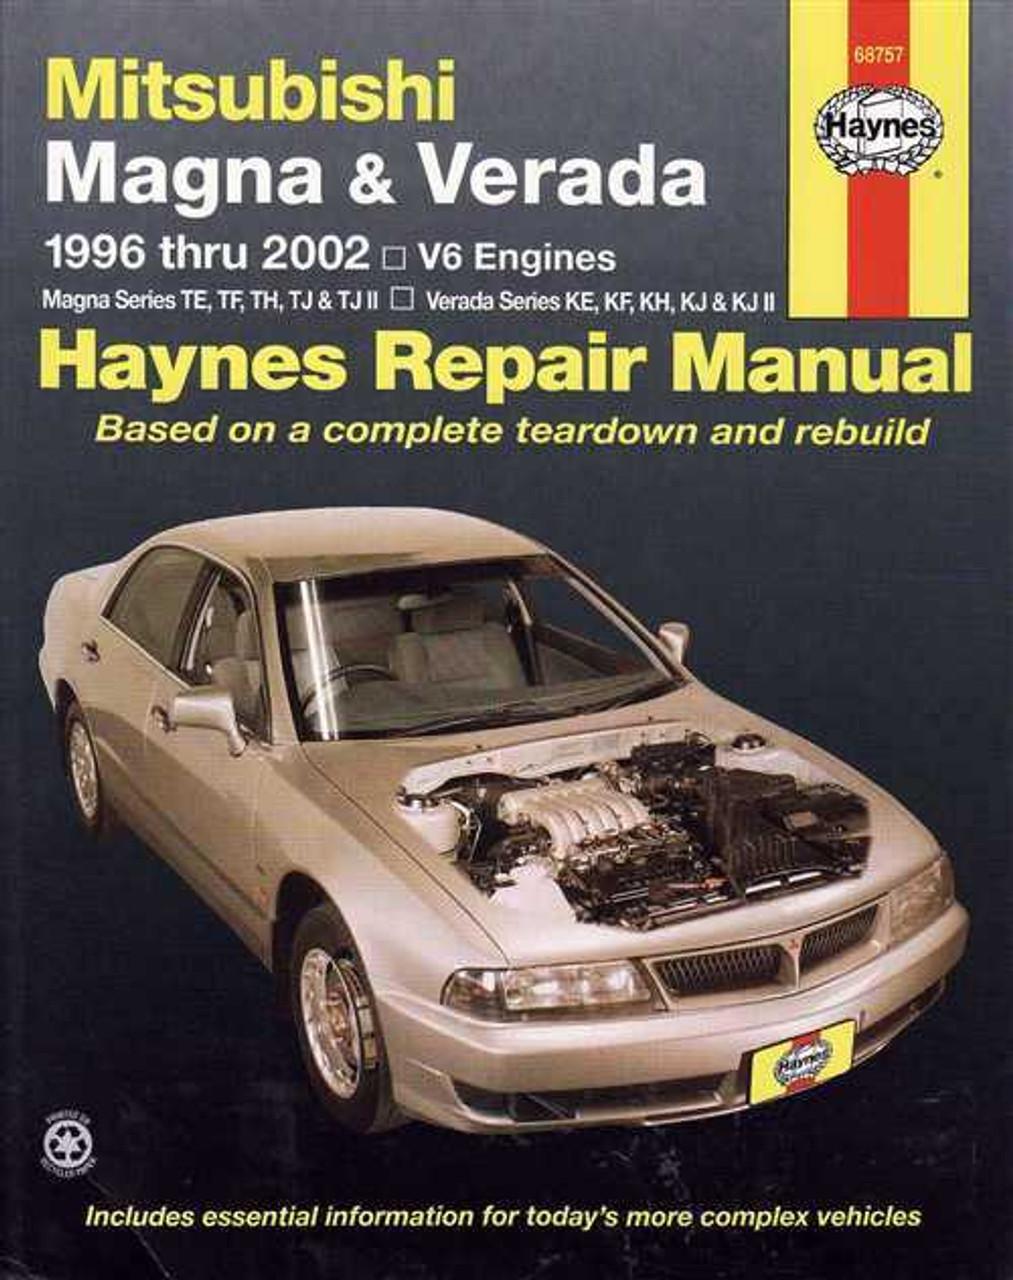 Mitsubishi Verada Wiring Diagram : Mitsubishi magna verada workshop manual